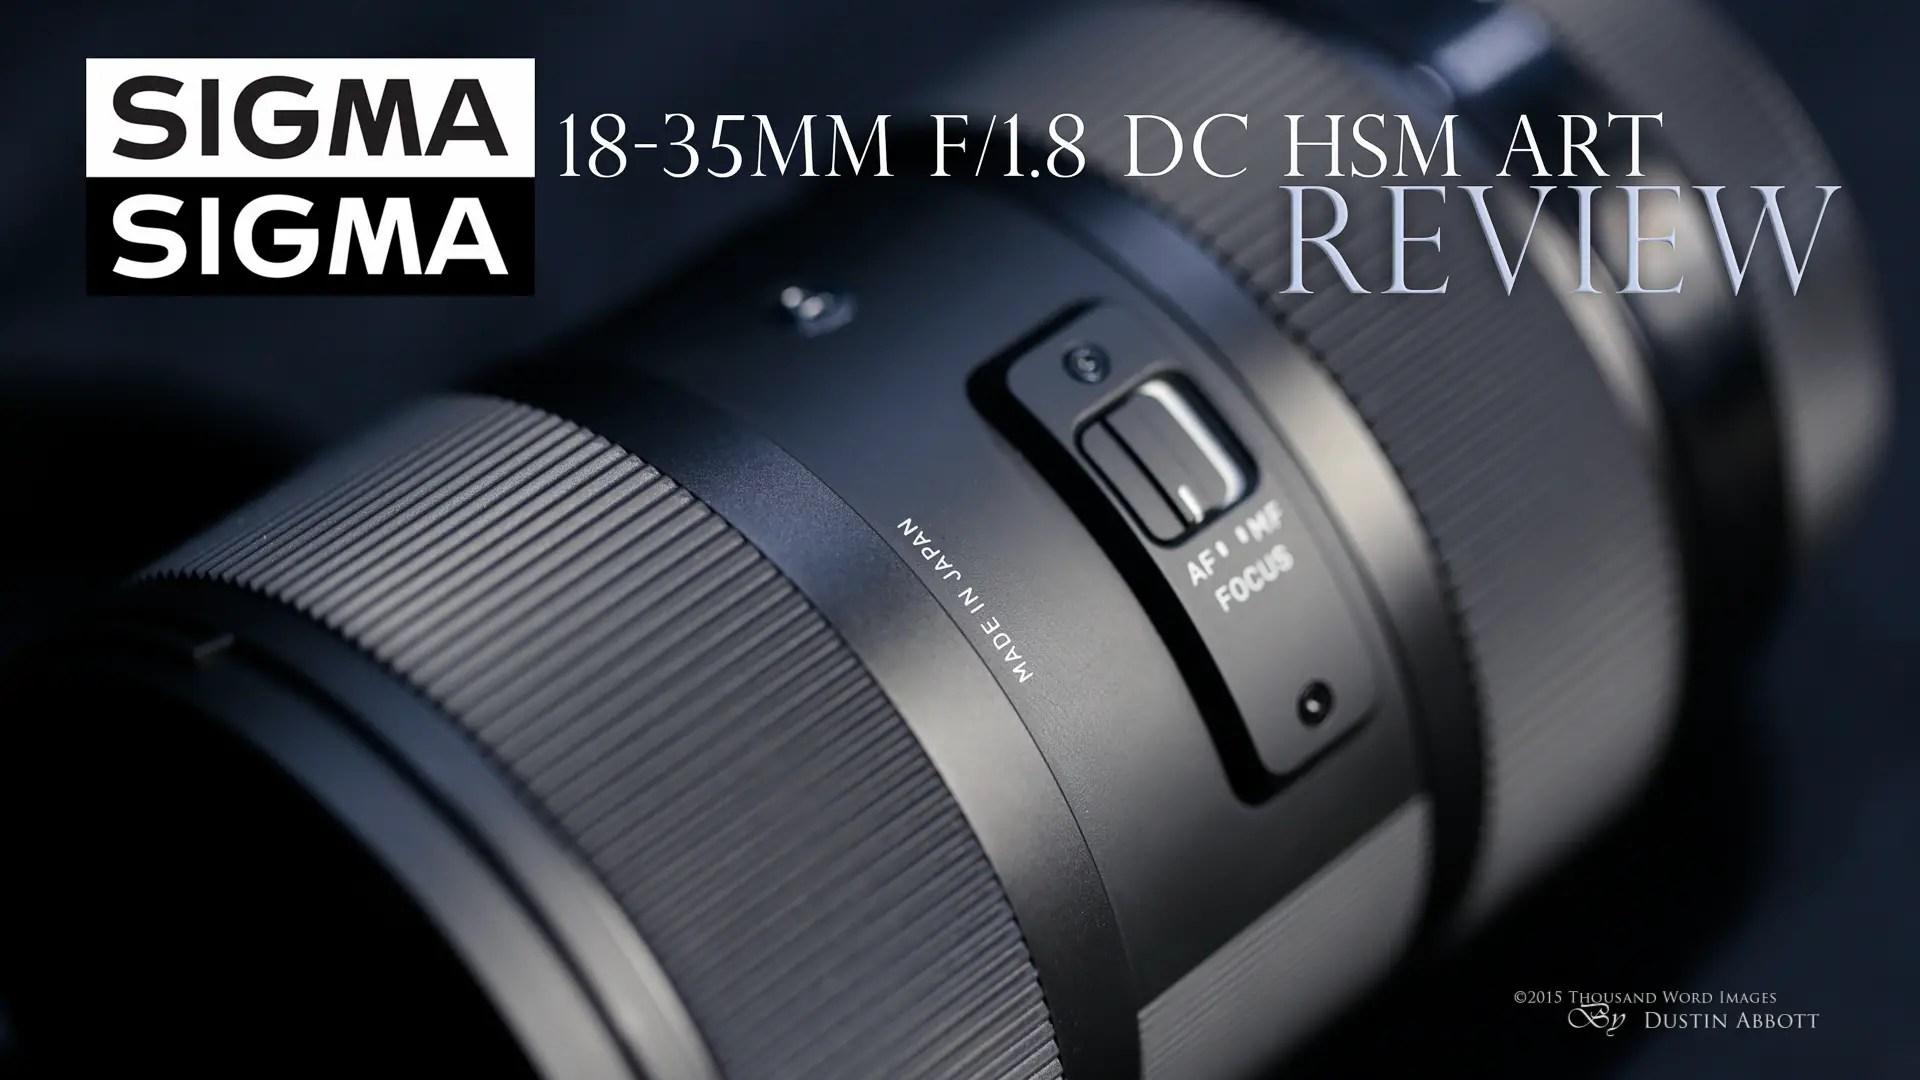 Sigma 18-35mm f/1.8 DC HSM ART Review - DustinAbbott.net